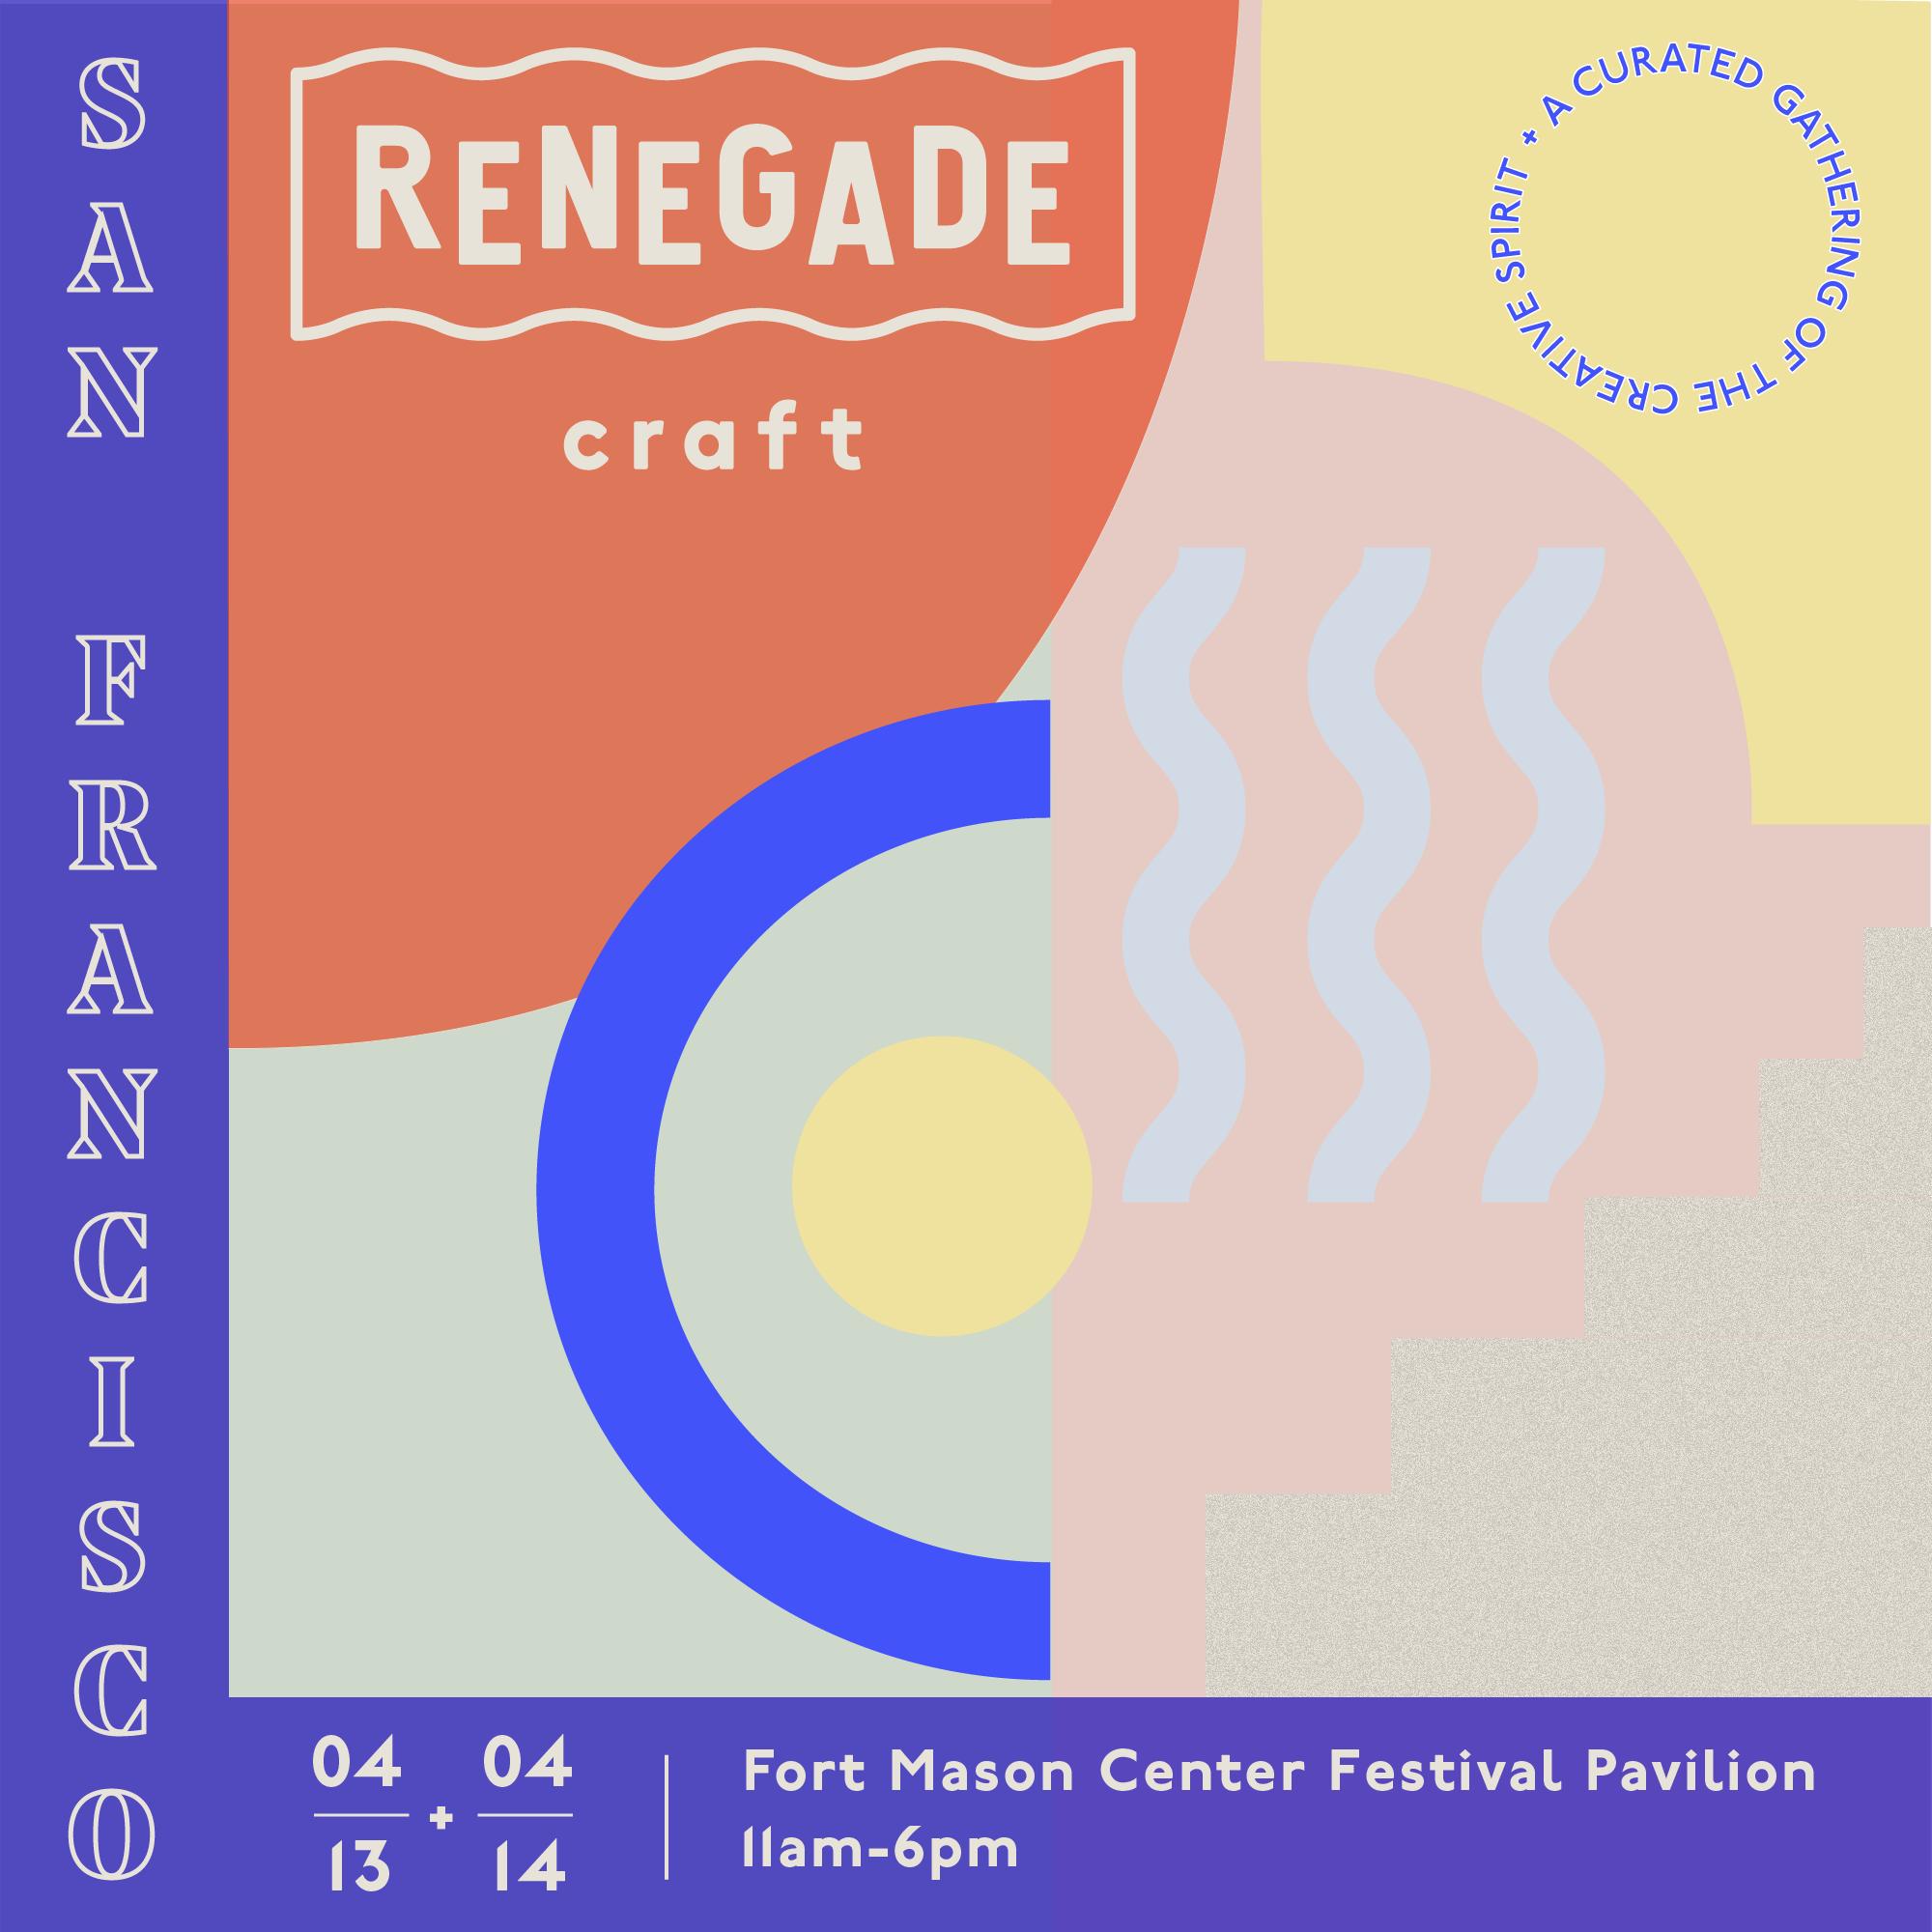 renegade 2019.png